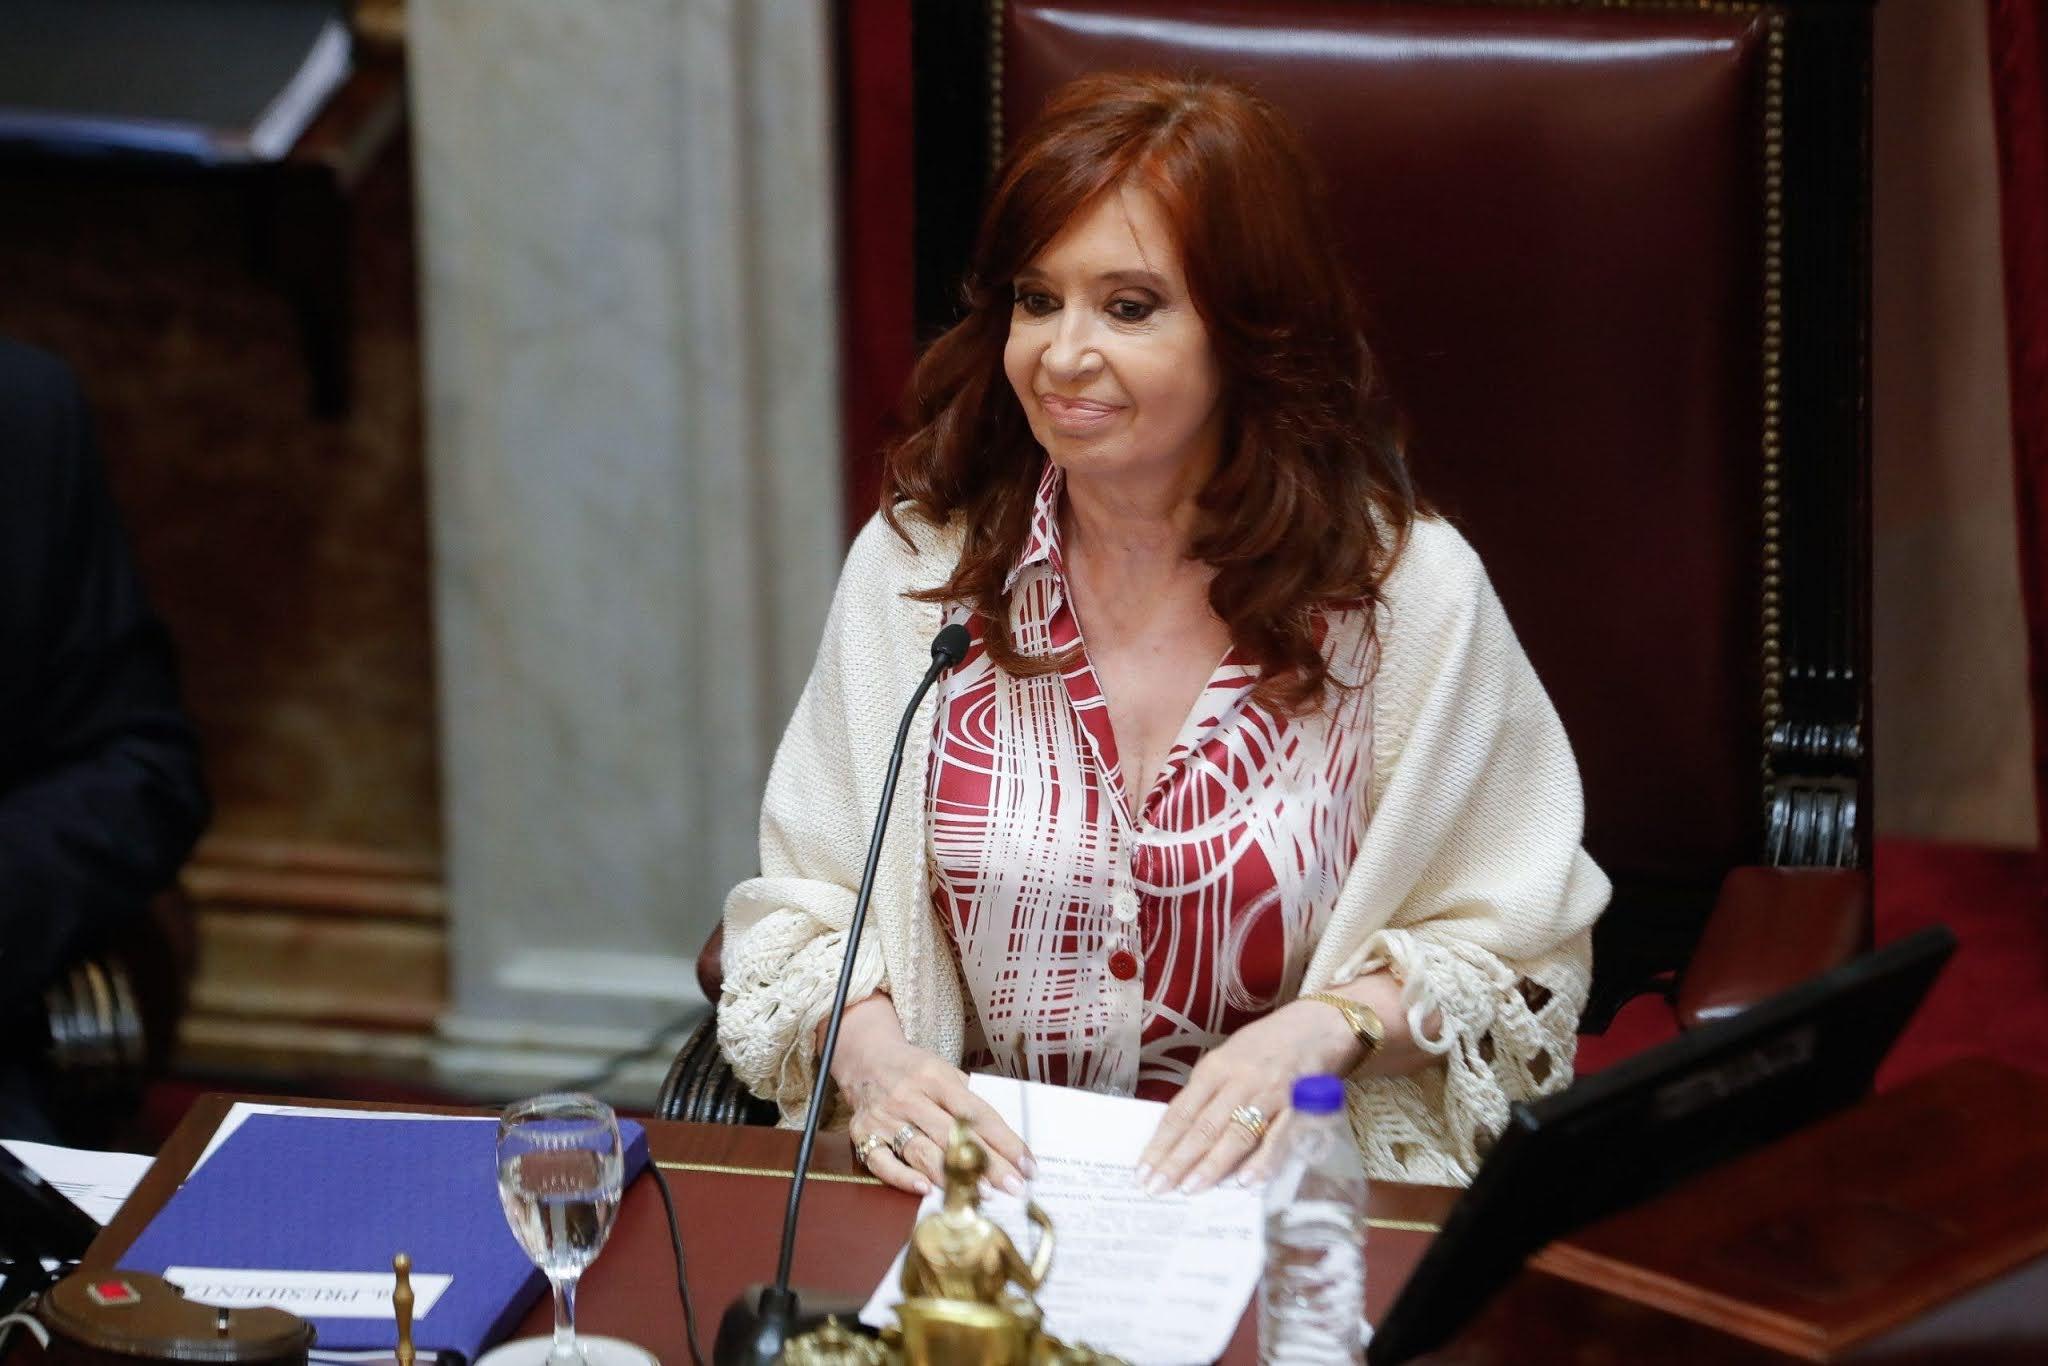 Causa Dólar futuro: la Justicia define si envía a Cristina Kirchner a juicio oral